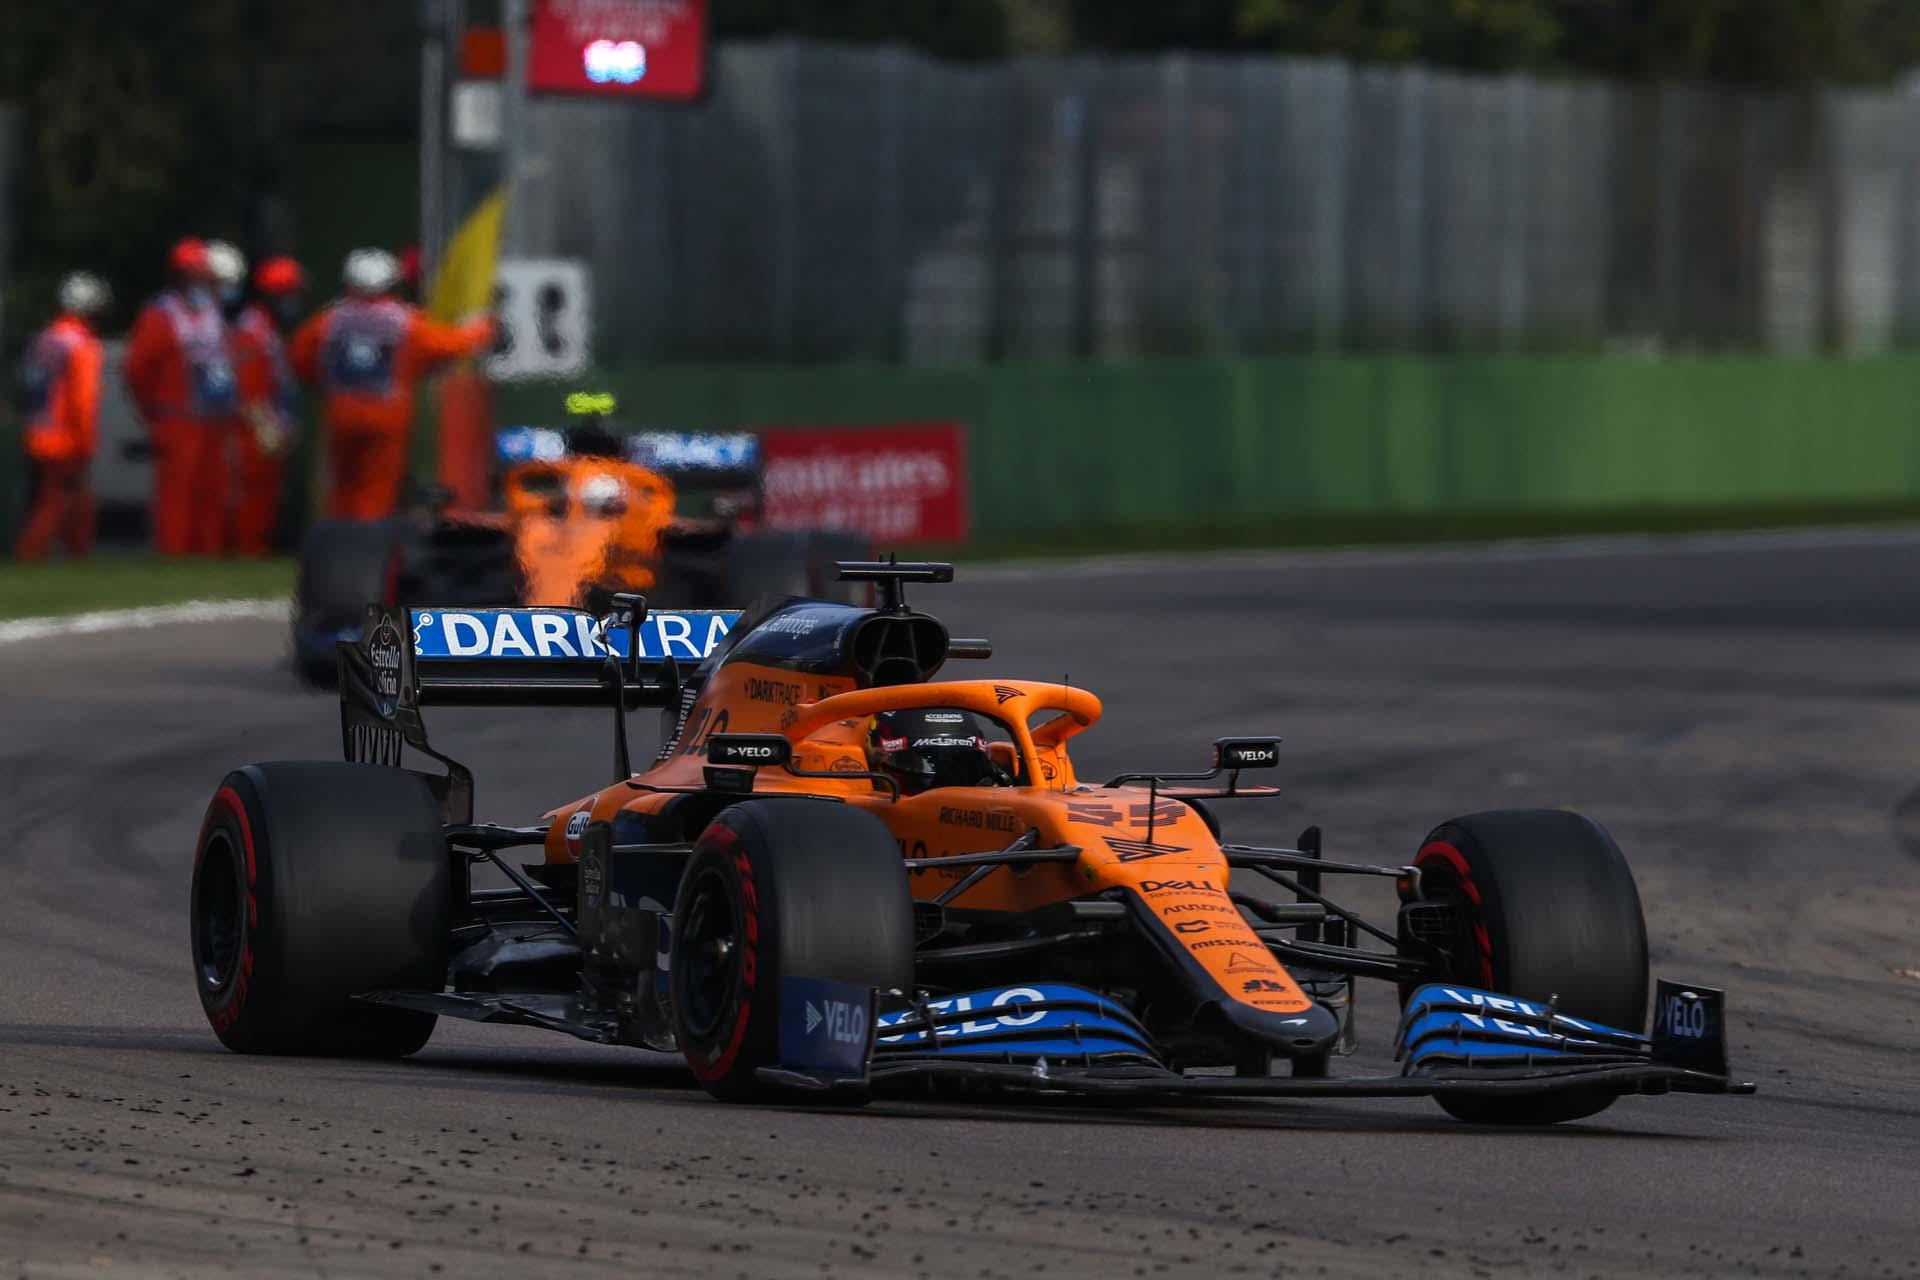 Carlos Sainz, McLaren MCL35, passes a marshals' post